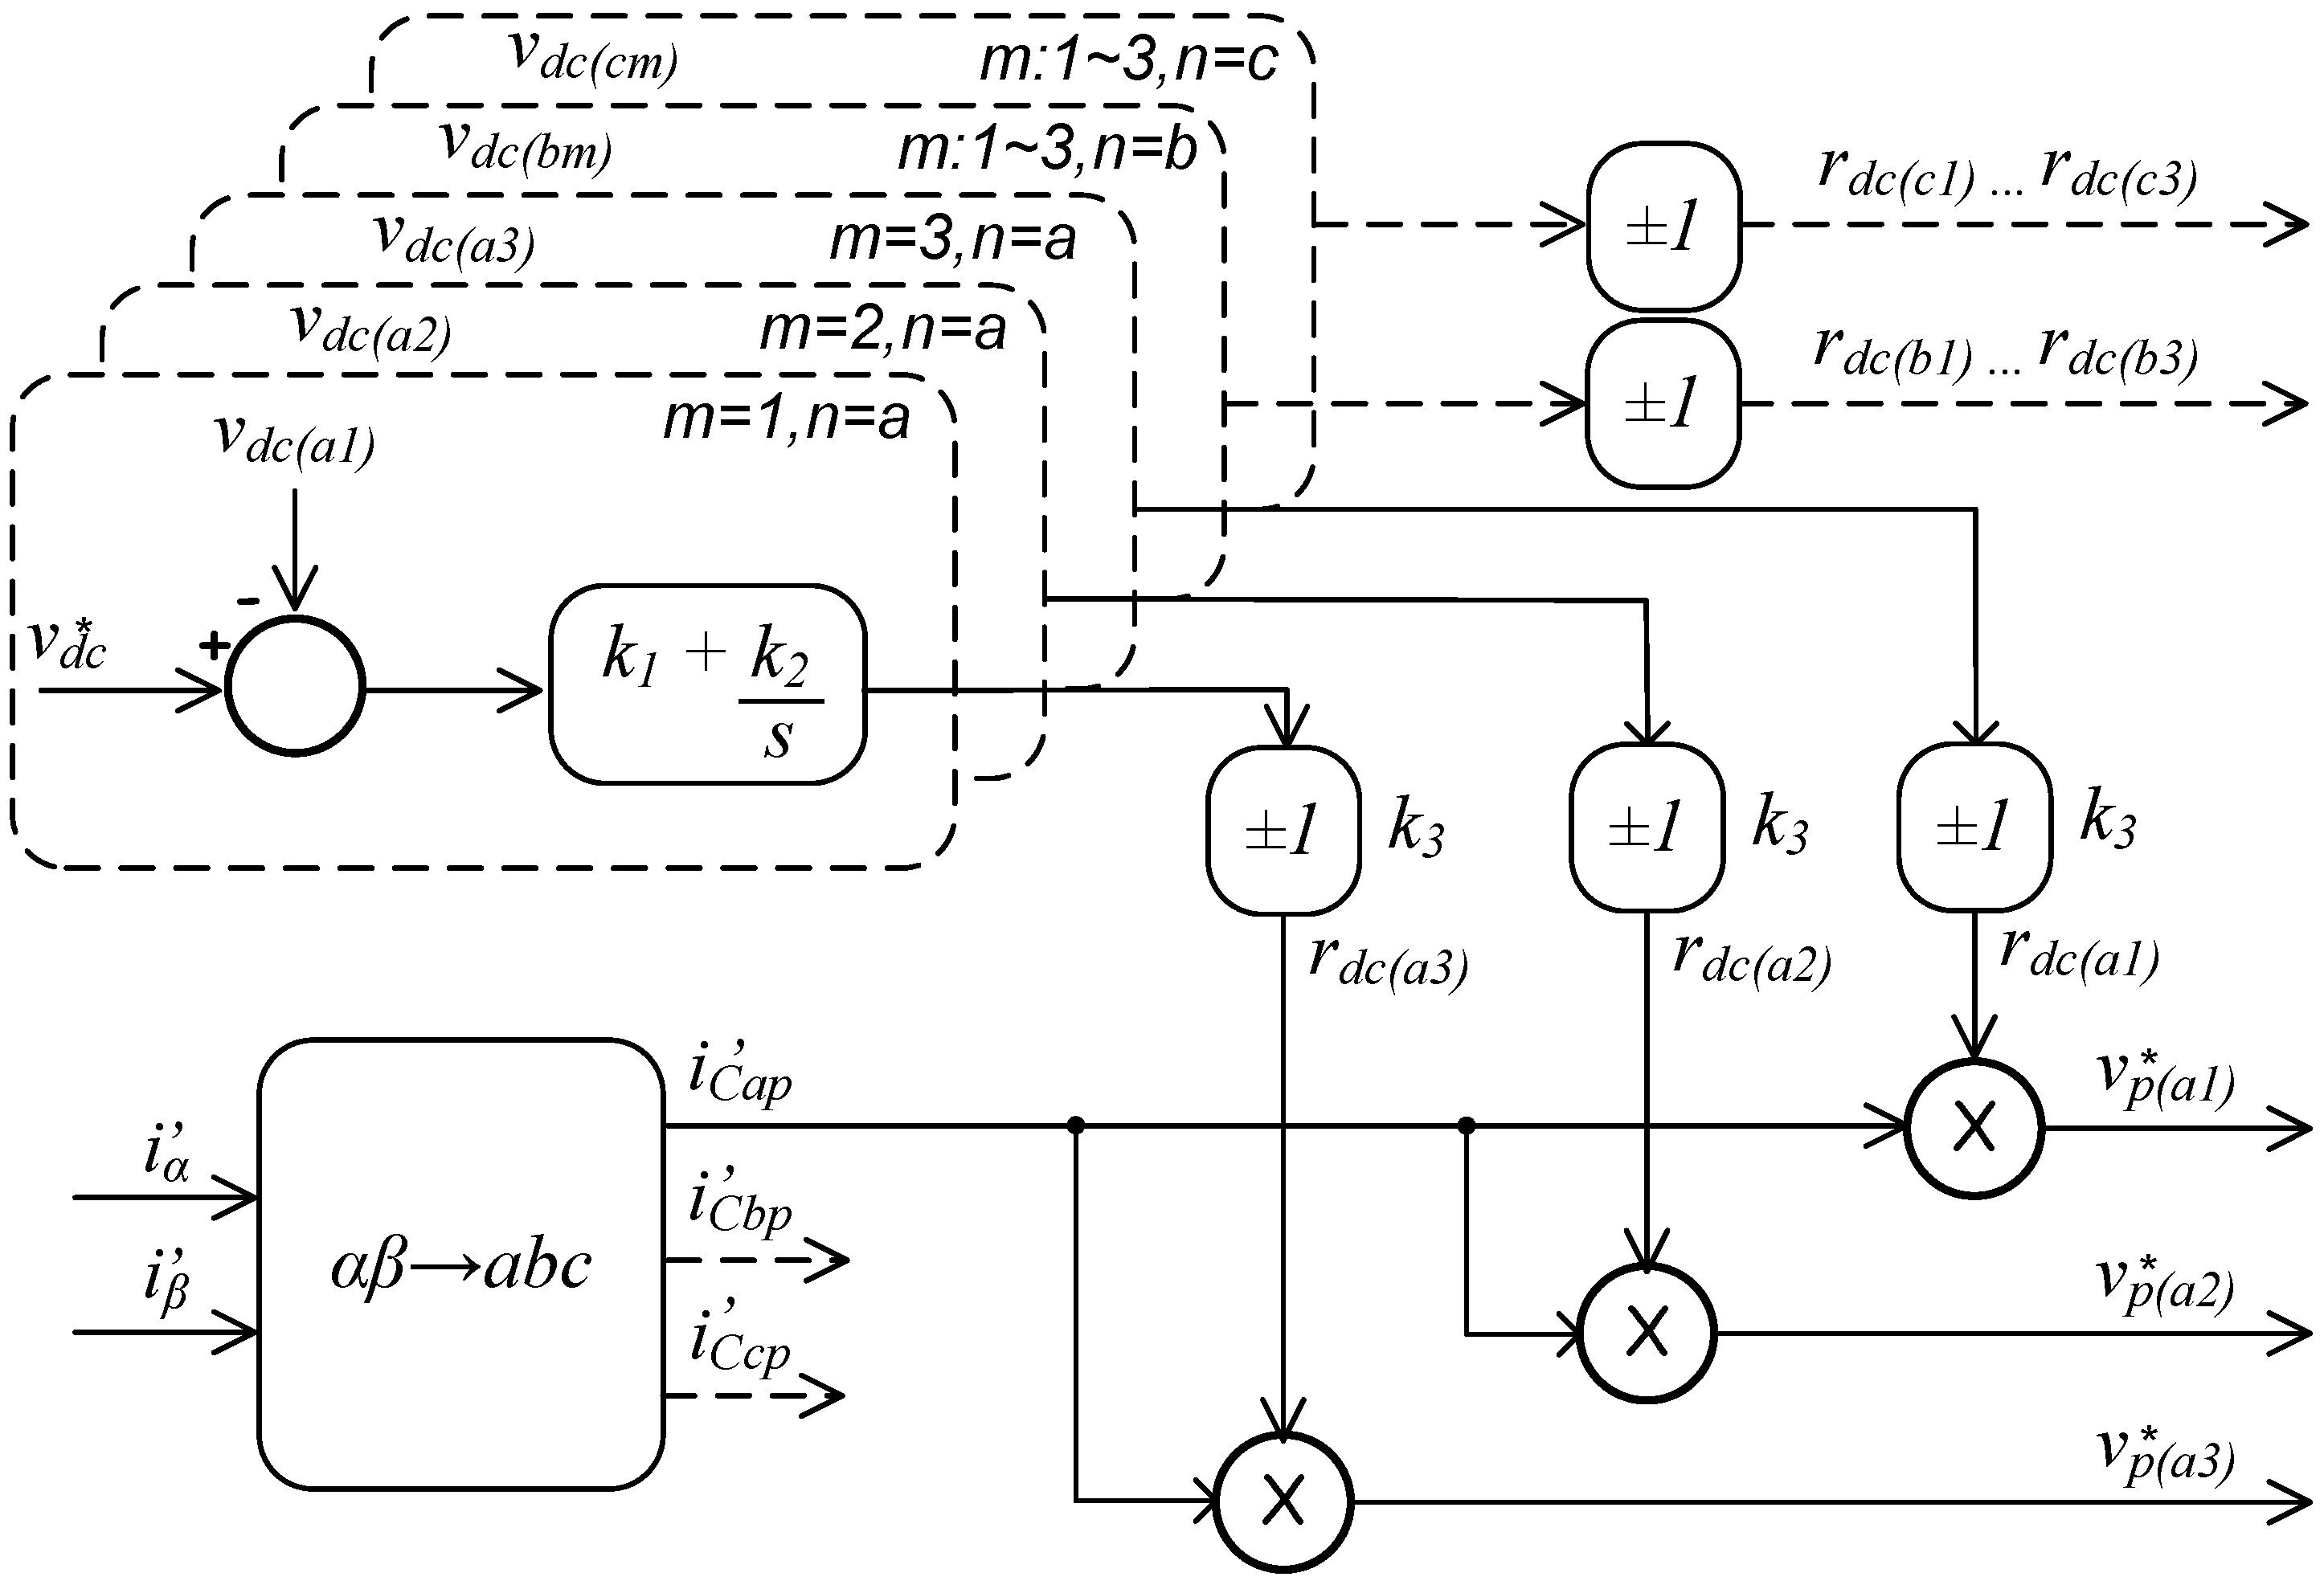 Dixon 2301 Wiring Diagrams For Honda Gbo C70 Wiringdiagram – Dixon Ztr 2301 Ignition Wiring Diagram